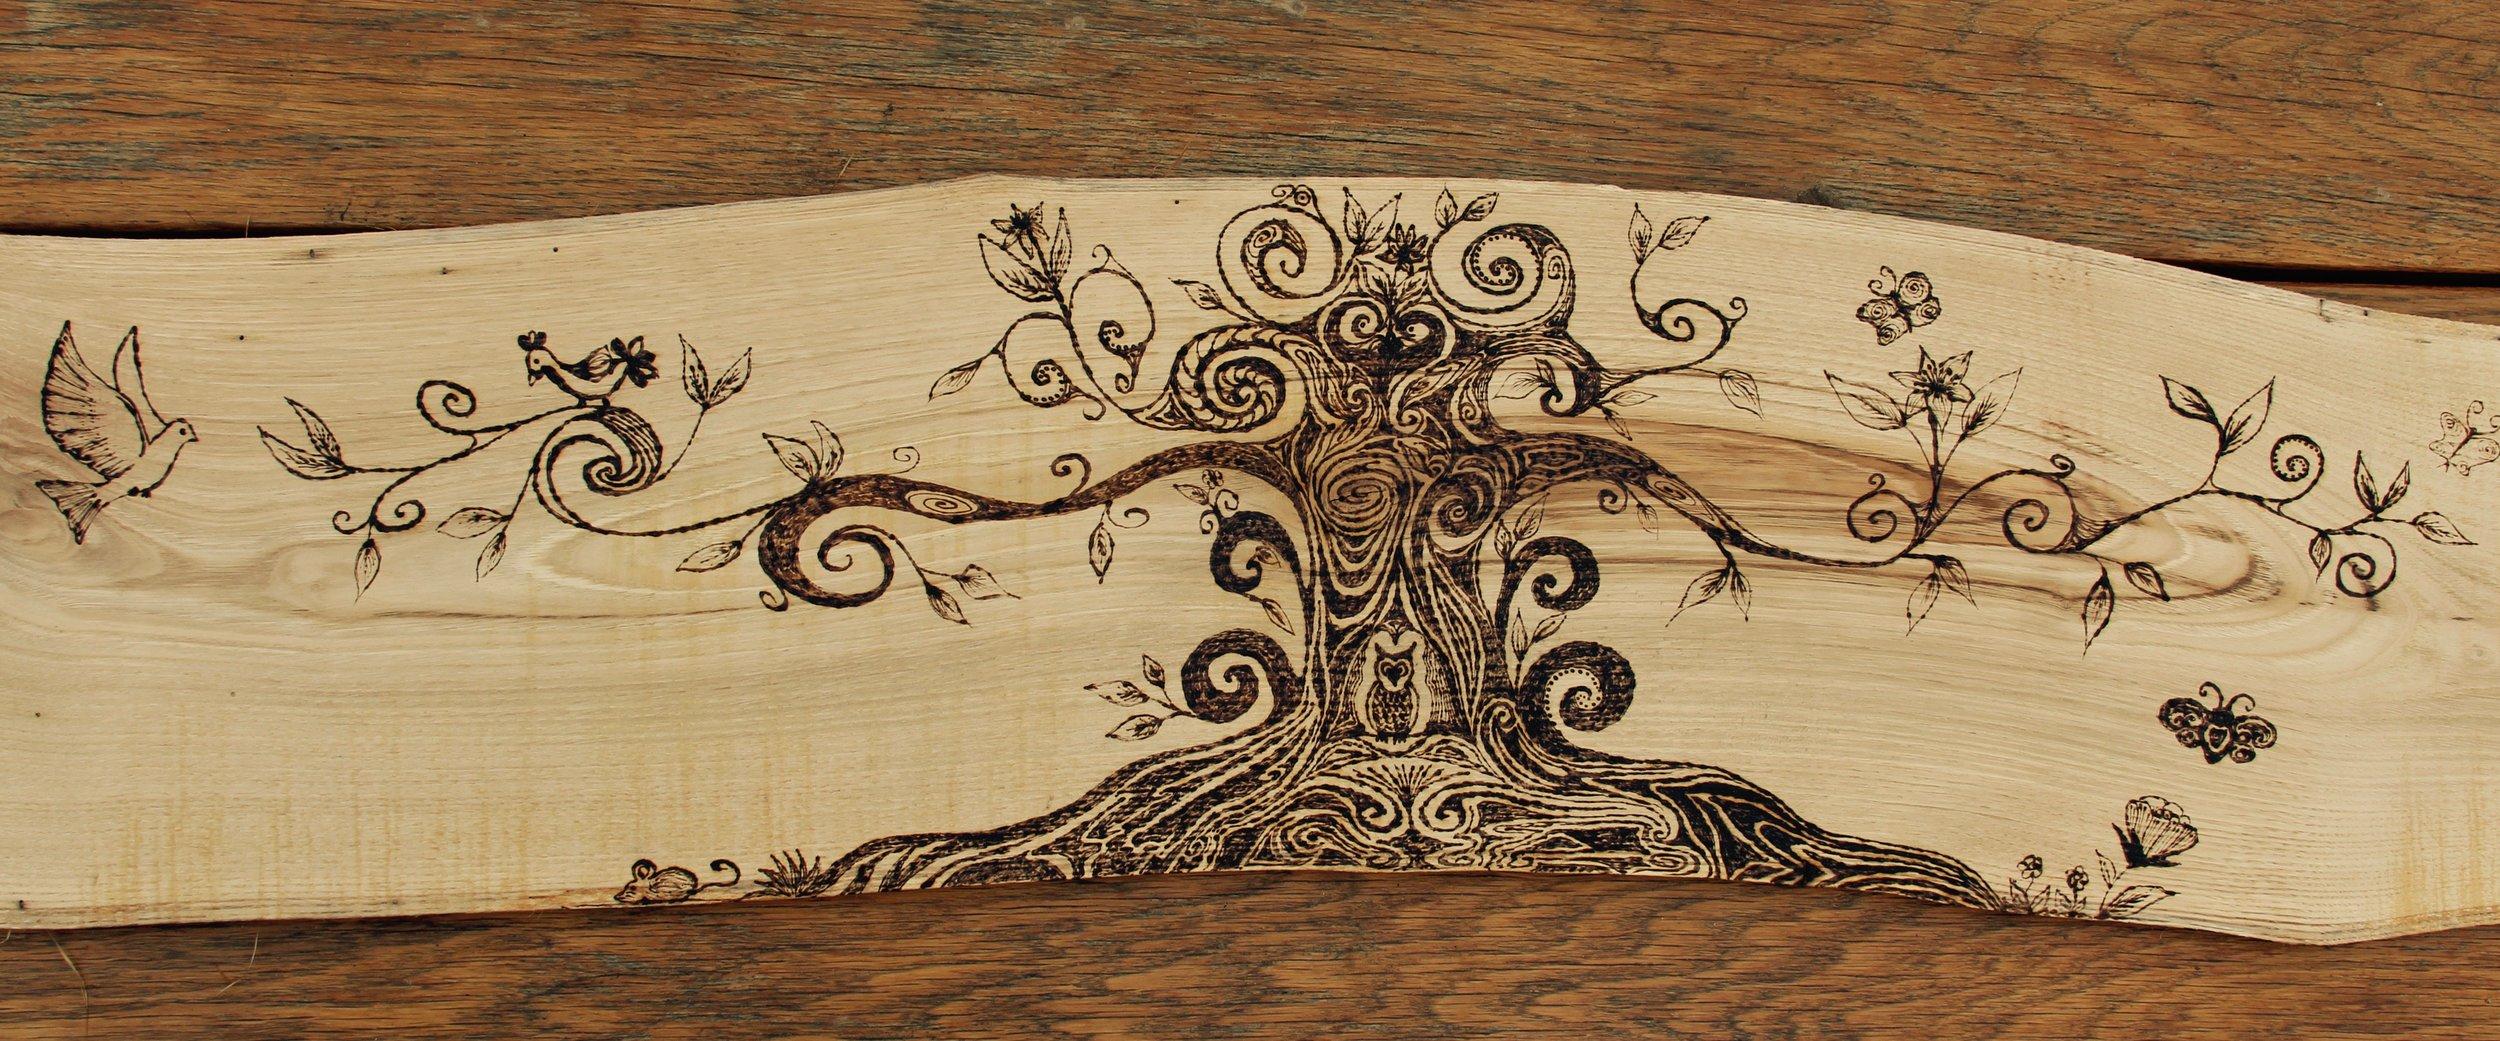 'Tree of Life' headboard design